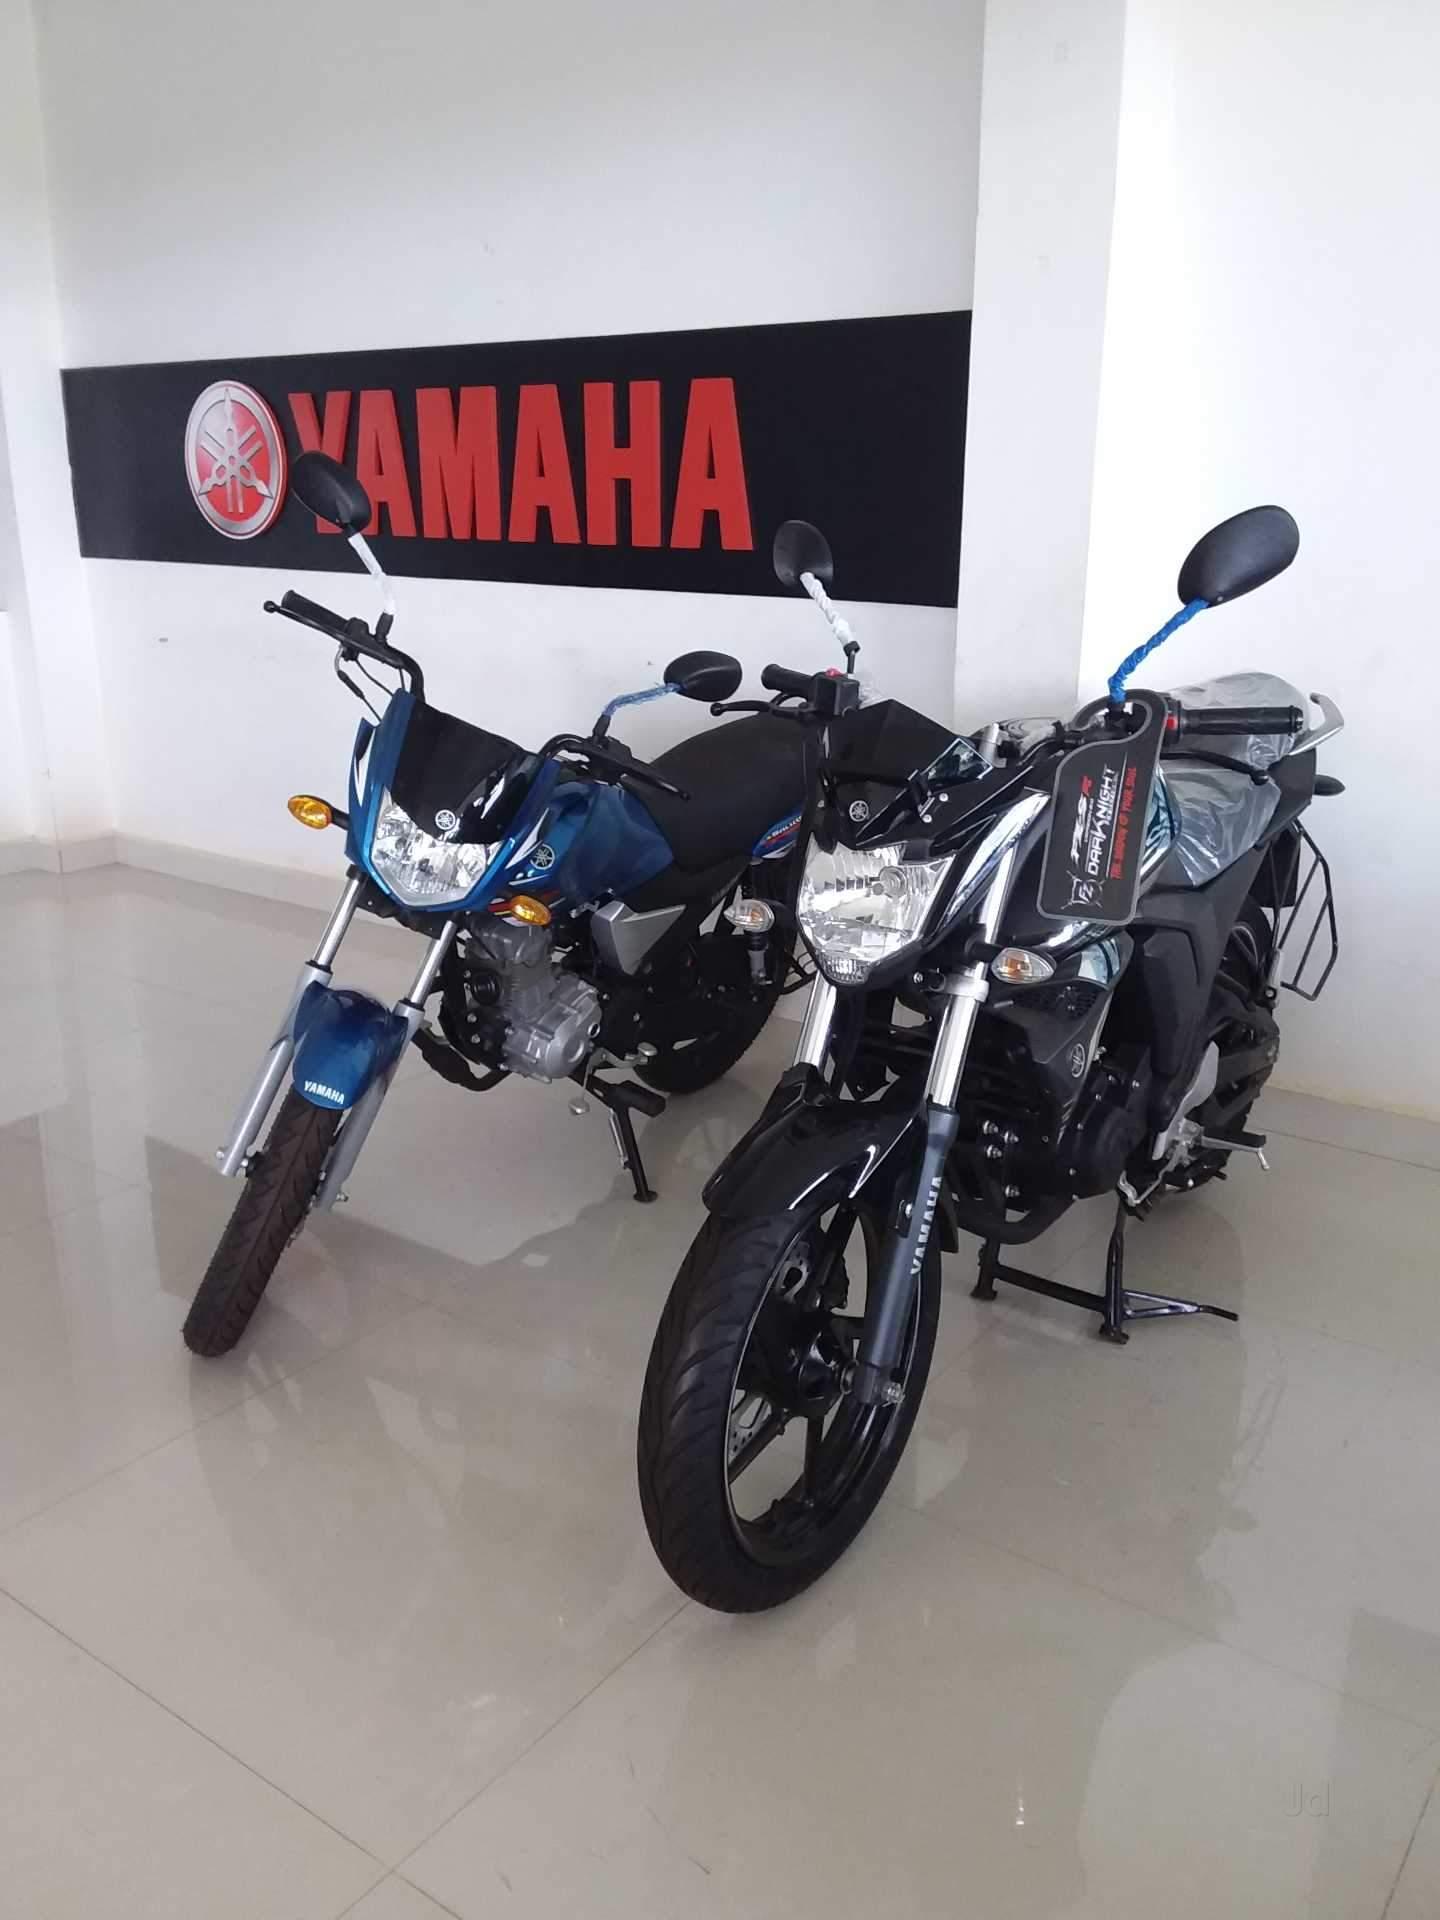 Top Yamaha Motorcycle Showrooms in Haveri - Yamaha Bikes - Justdial